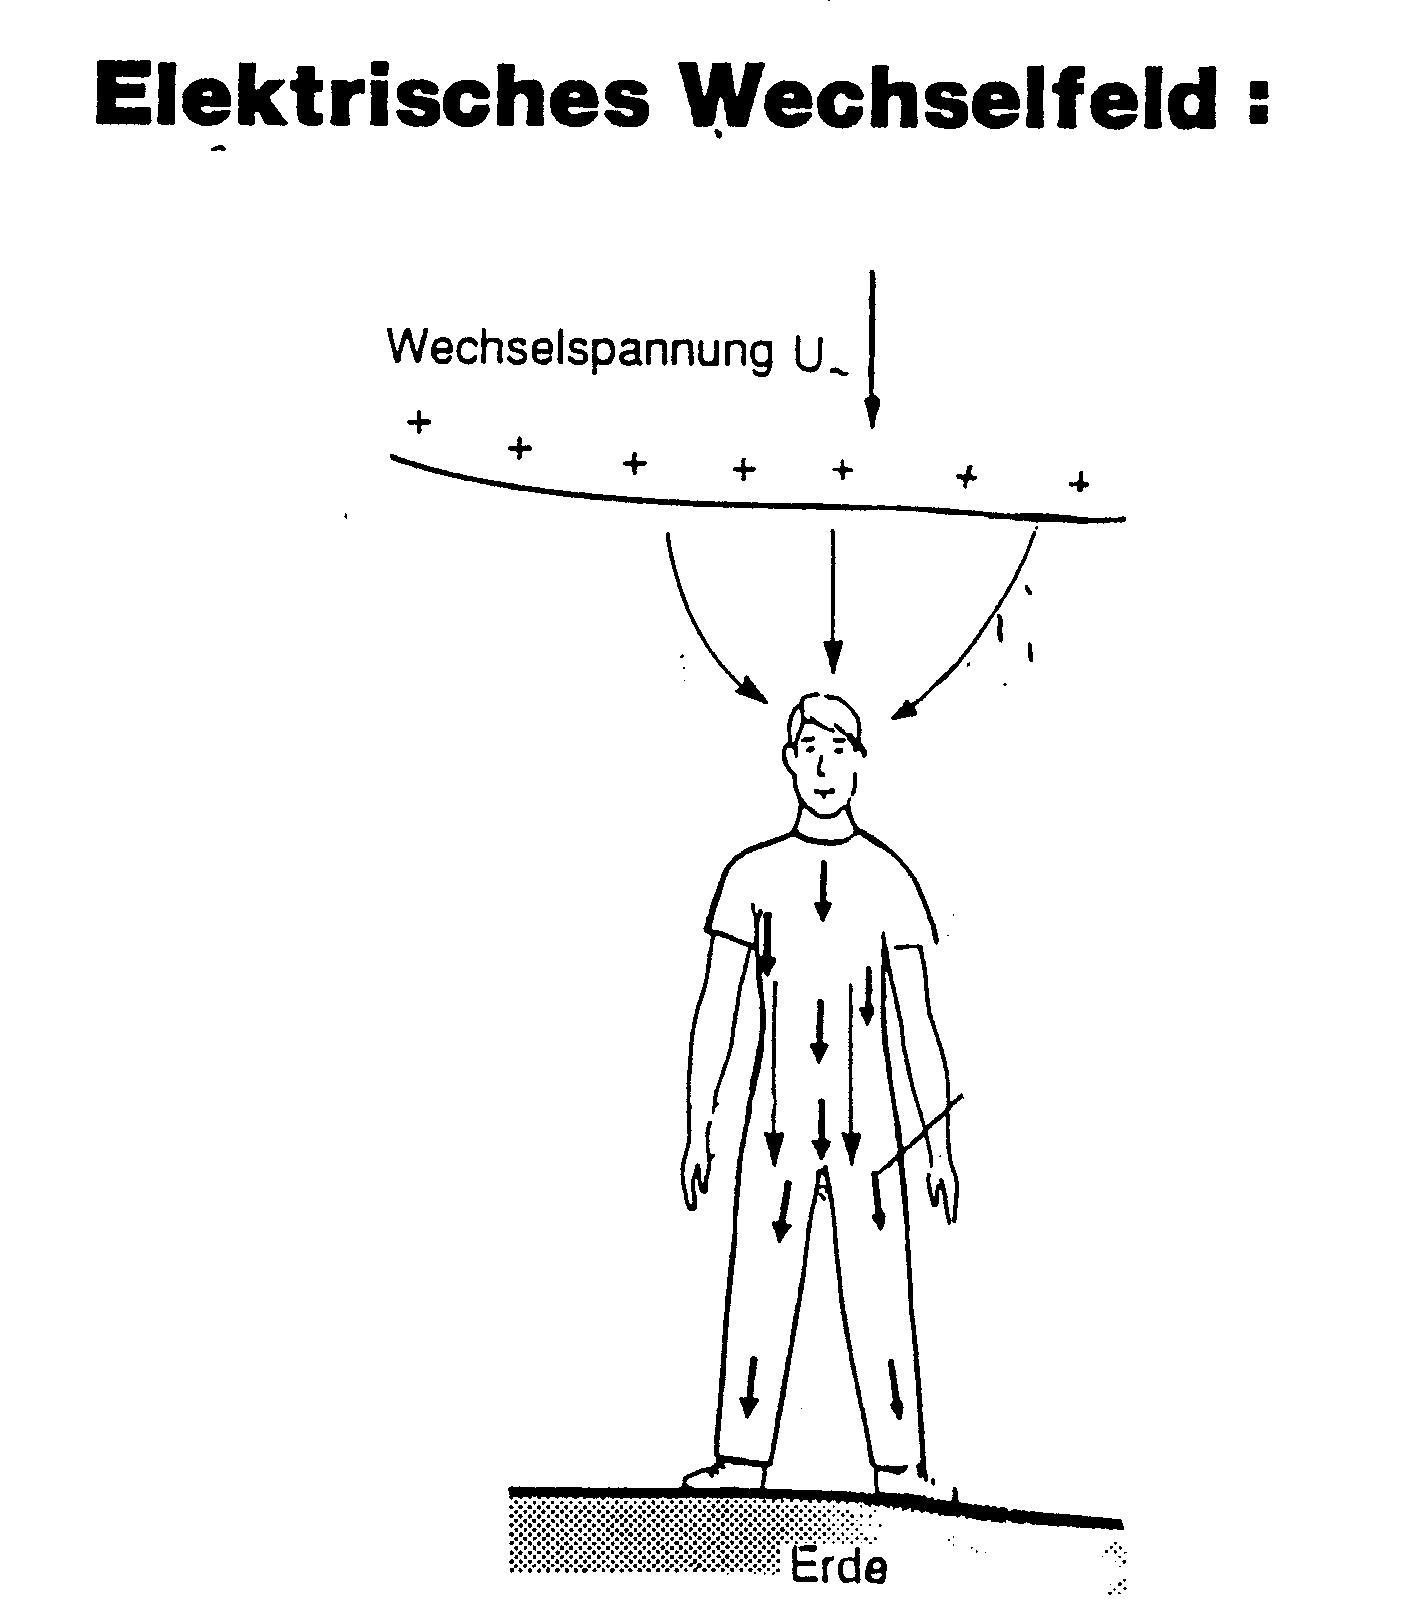 elektrische wechselfelder peter czehowsky